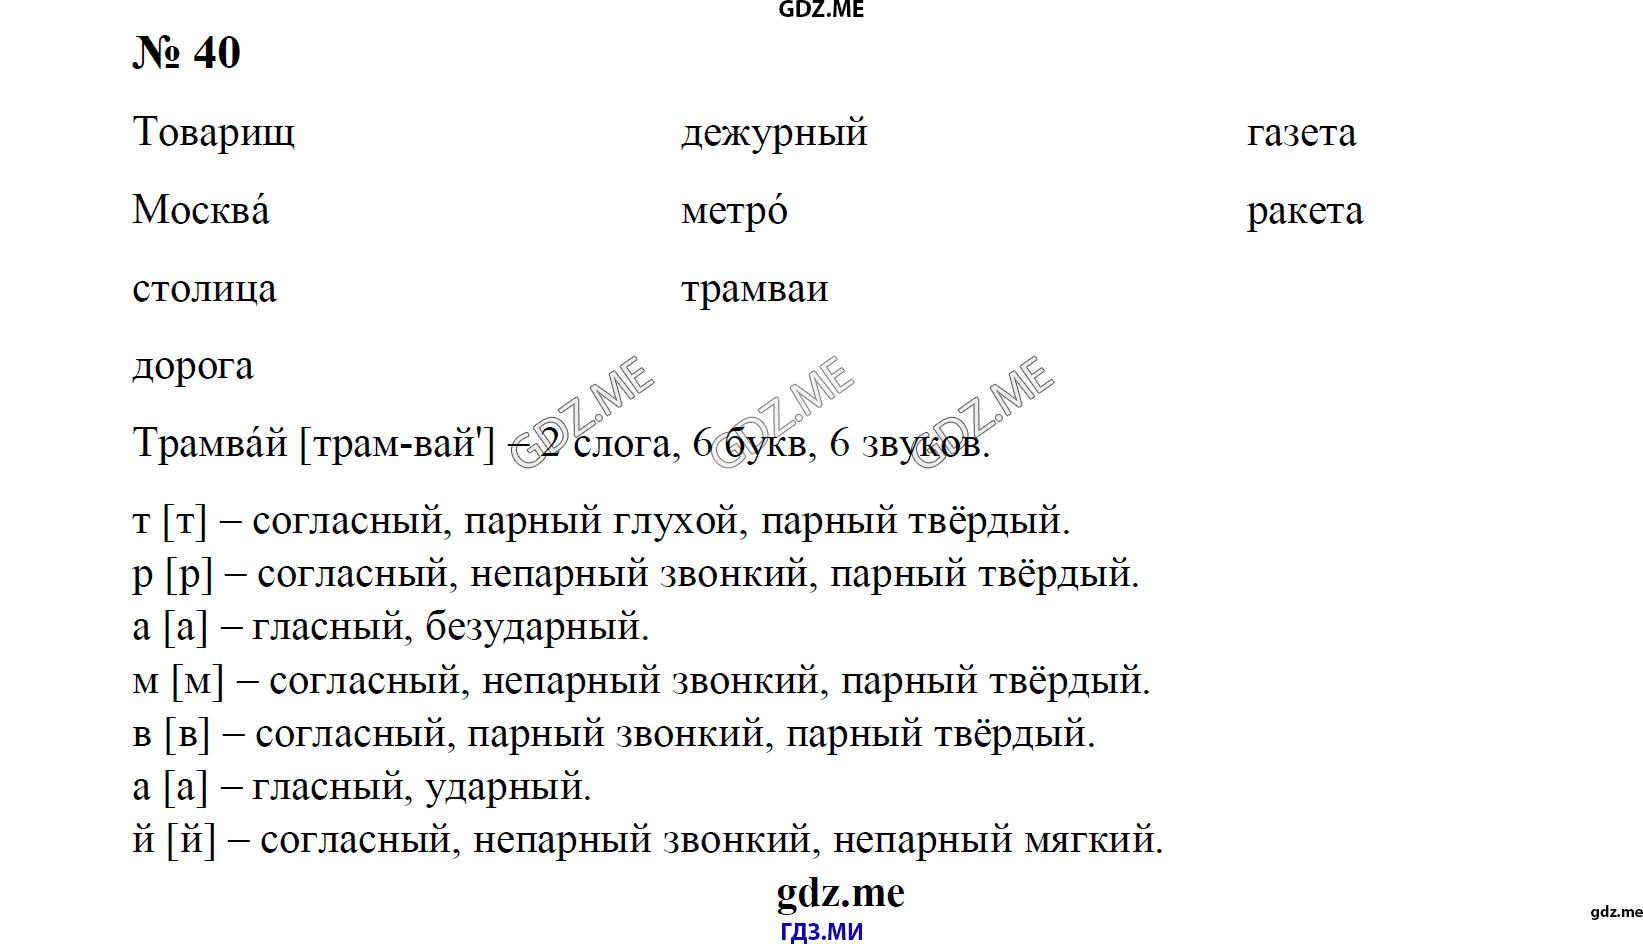 Гдз от путина по русскому языку 4 класс рамзаева 2 части.